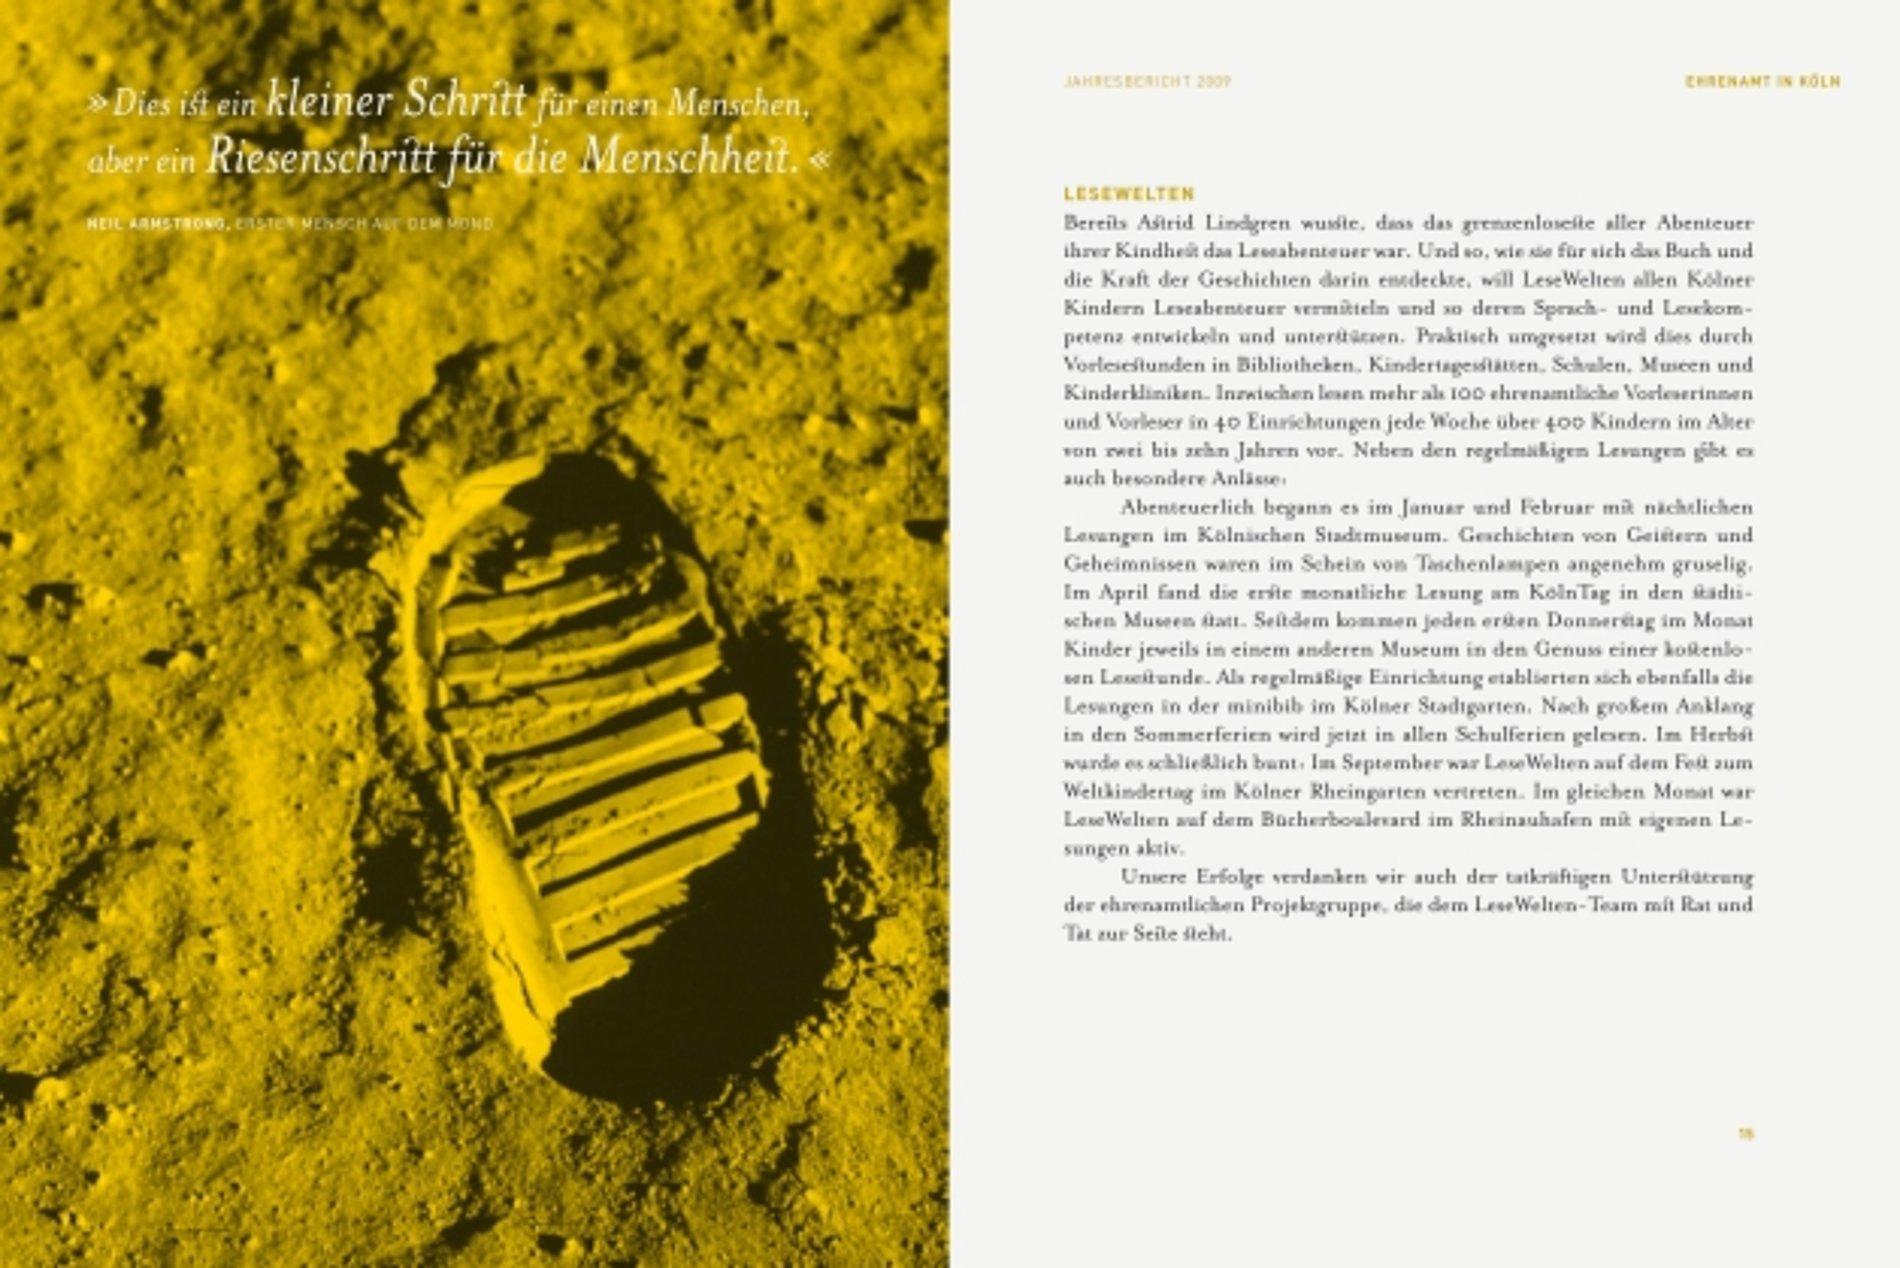 KFA Annual Report 2009 | Red Dot Design Award